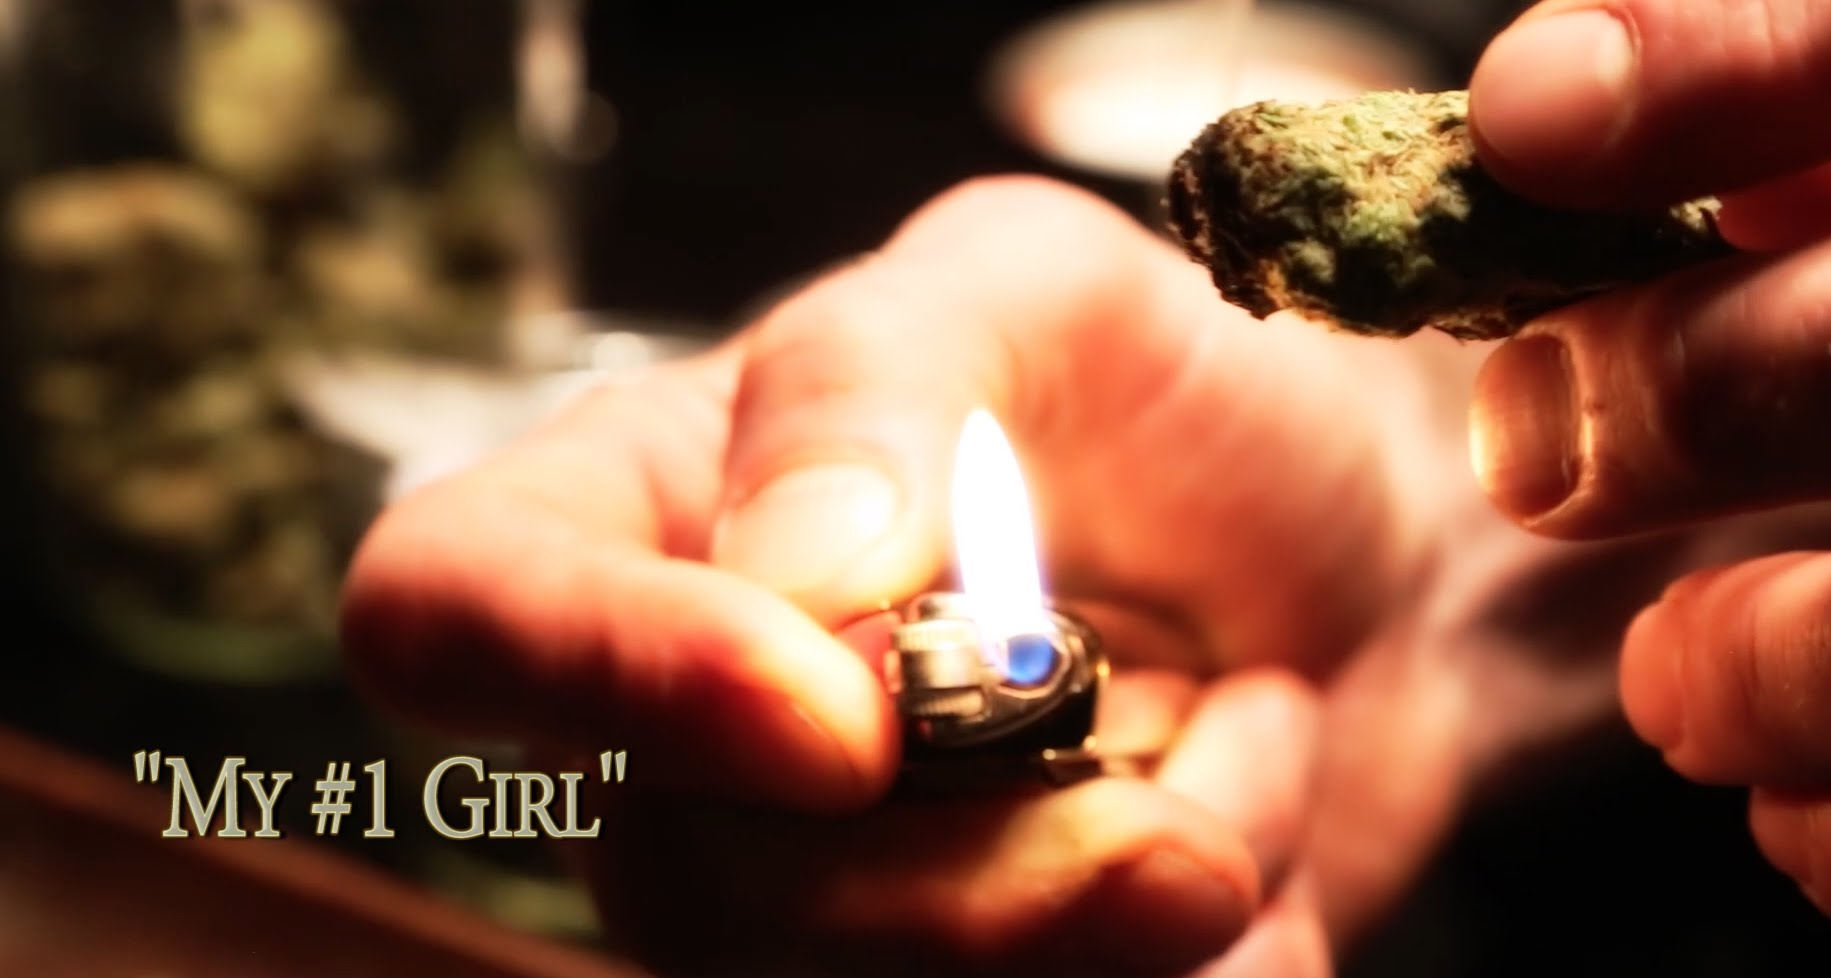 SoulMedic - My #1 Girl [4/20/2015]